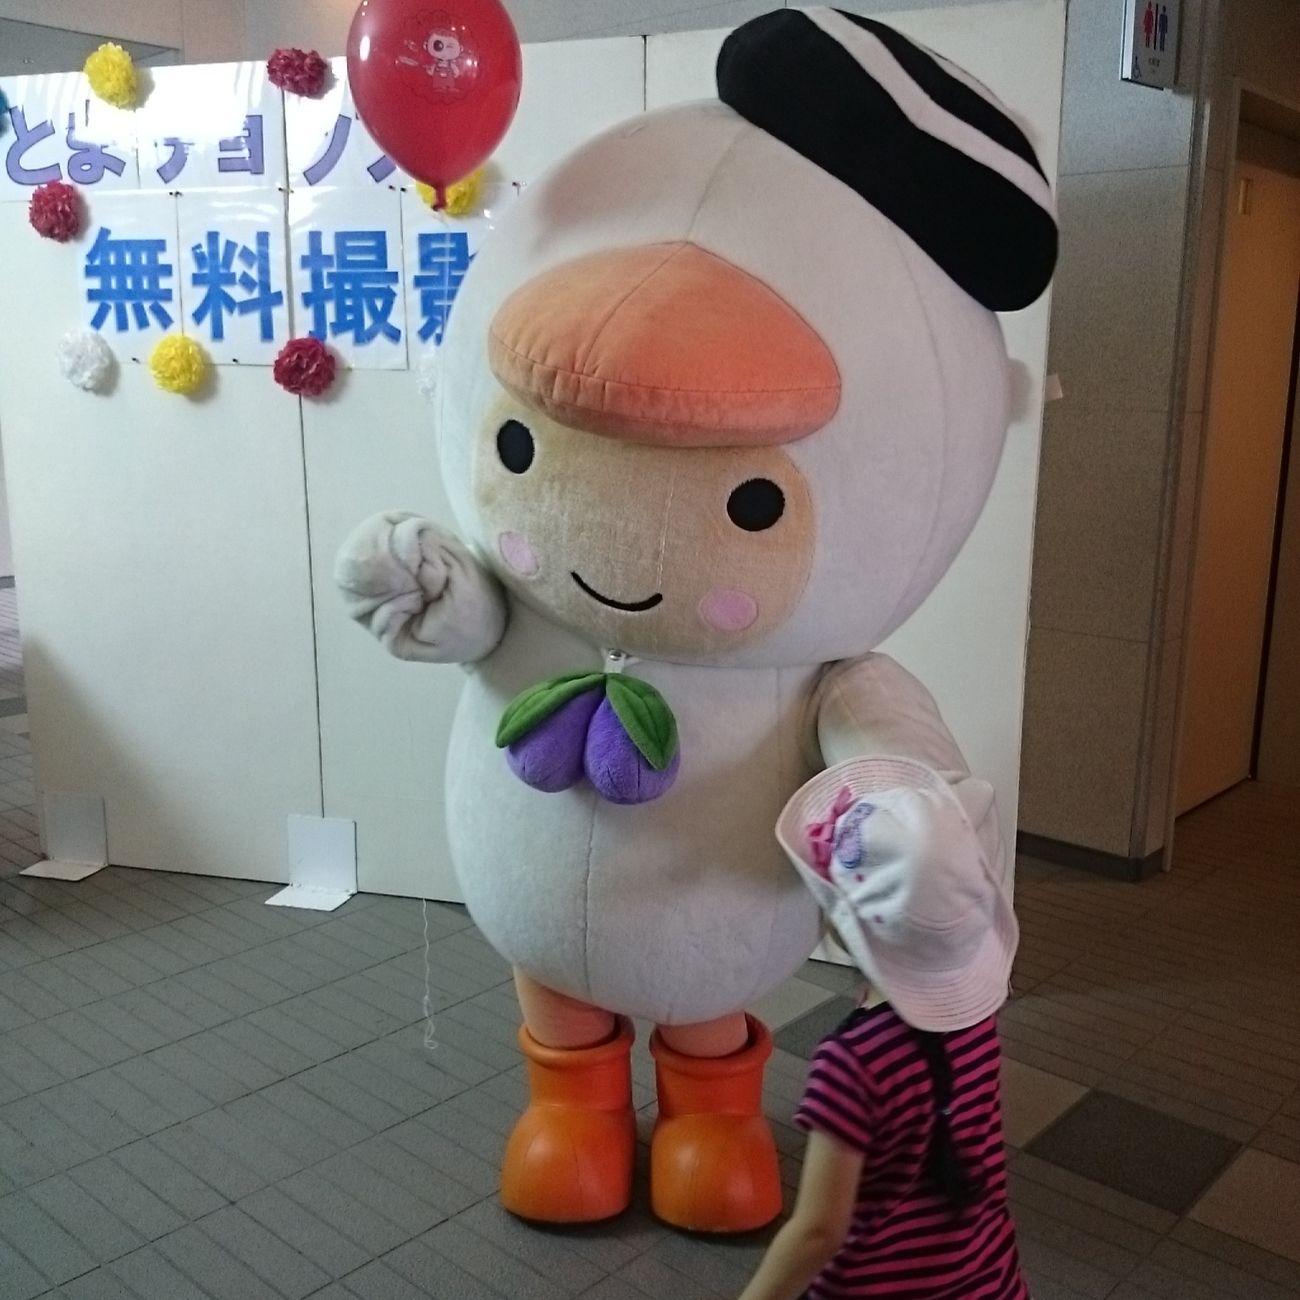 Tomachop Hokkaido,Japan Mascot Characters Of JAPAN ご当地キャラ  エコフェスタに来ていたとまチョップ(・ω・)。